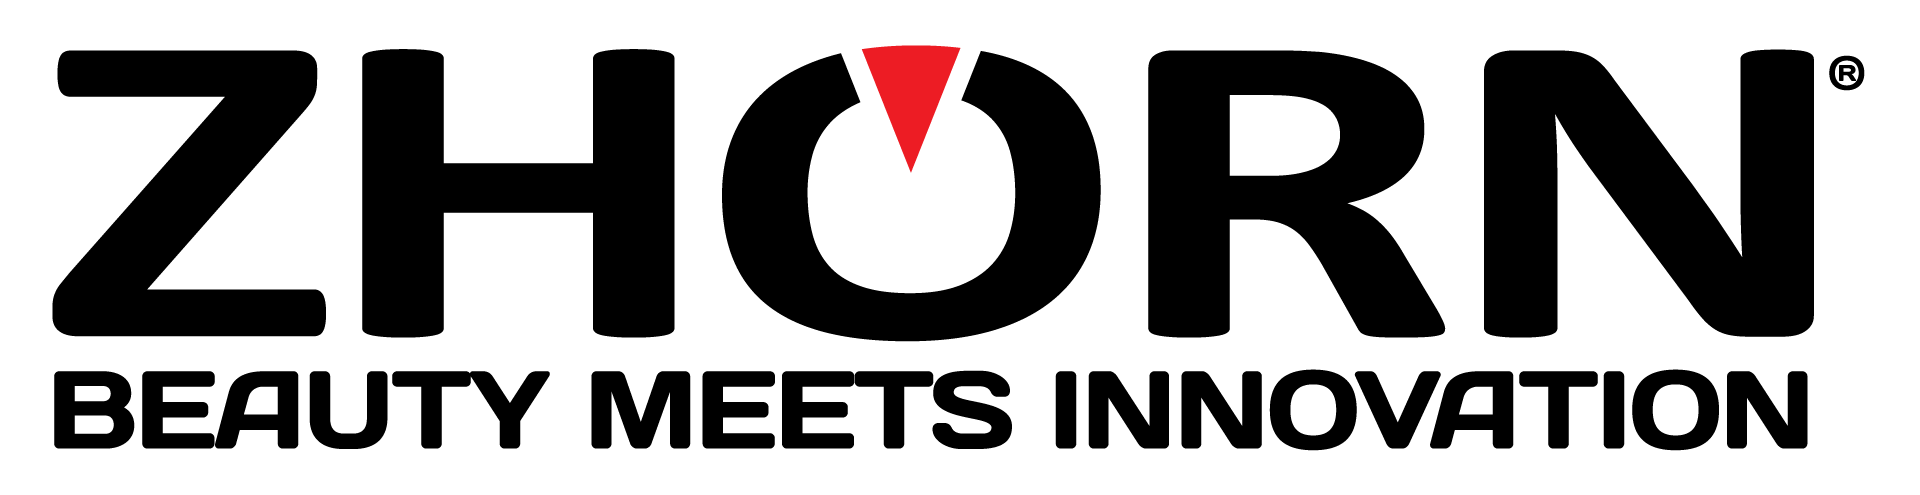 img/settings/logo.png